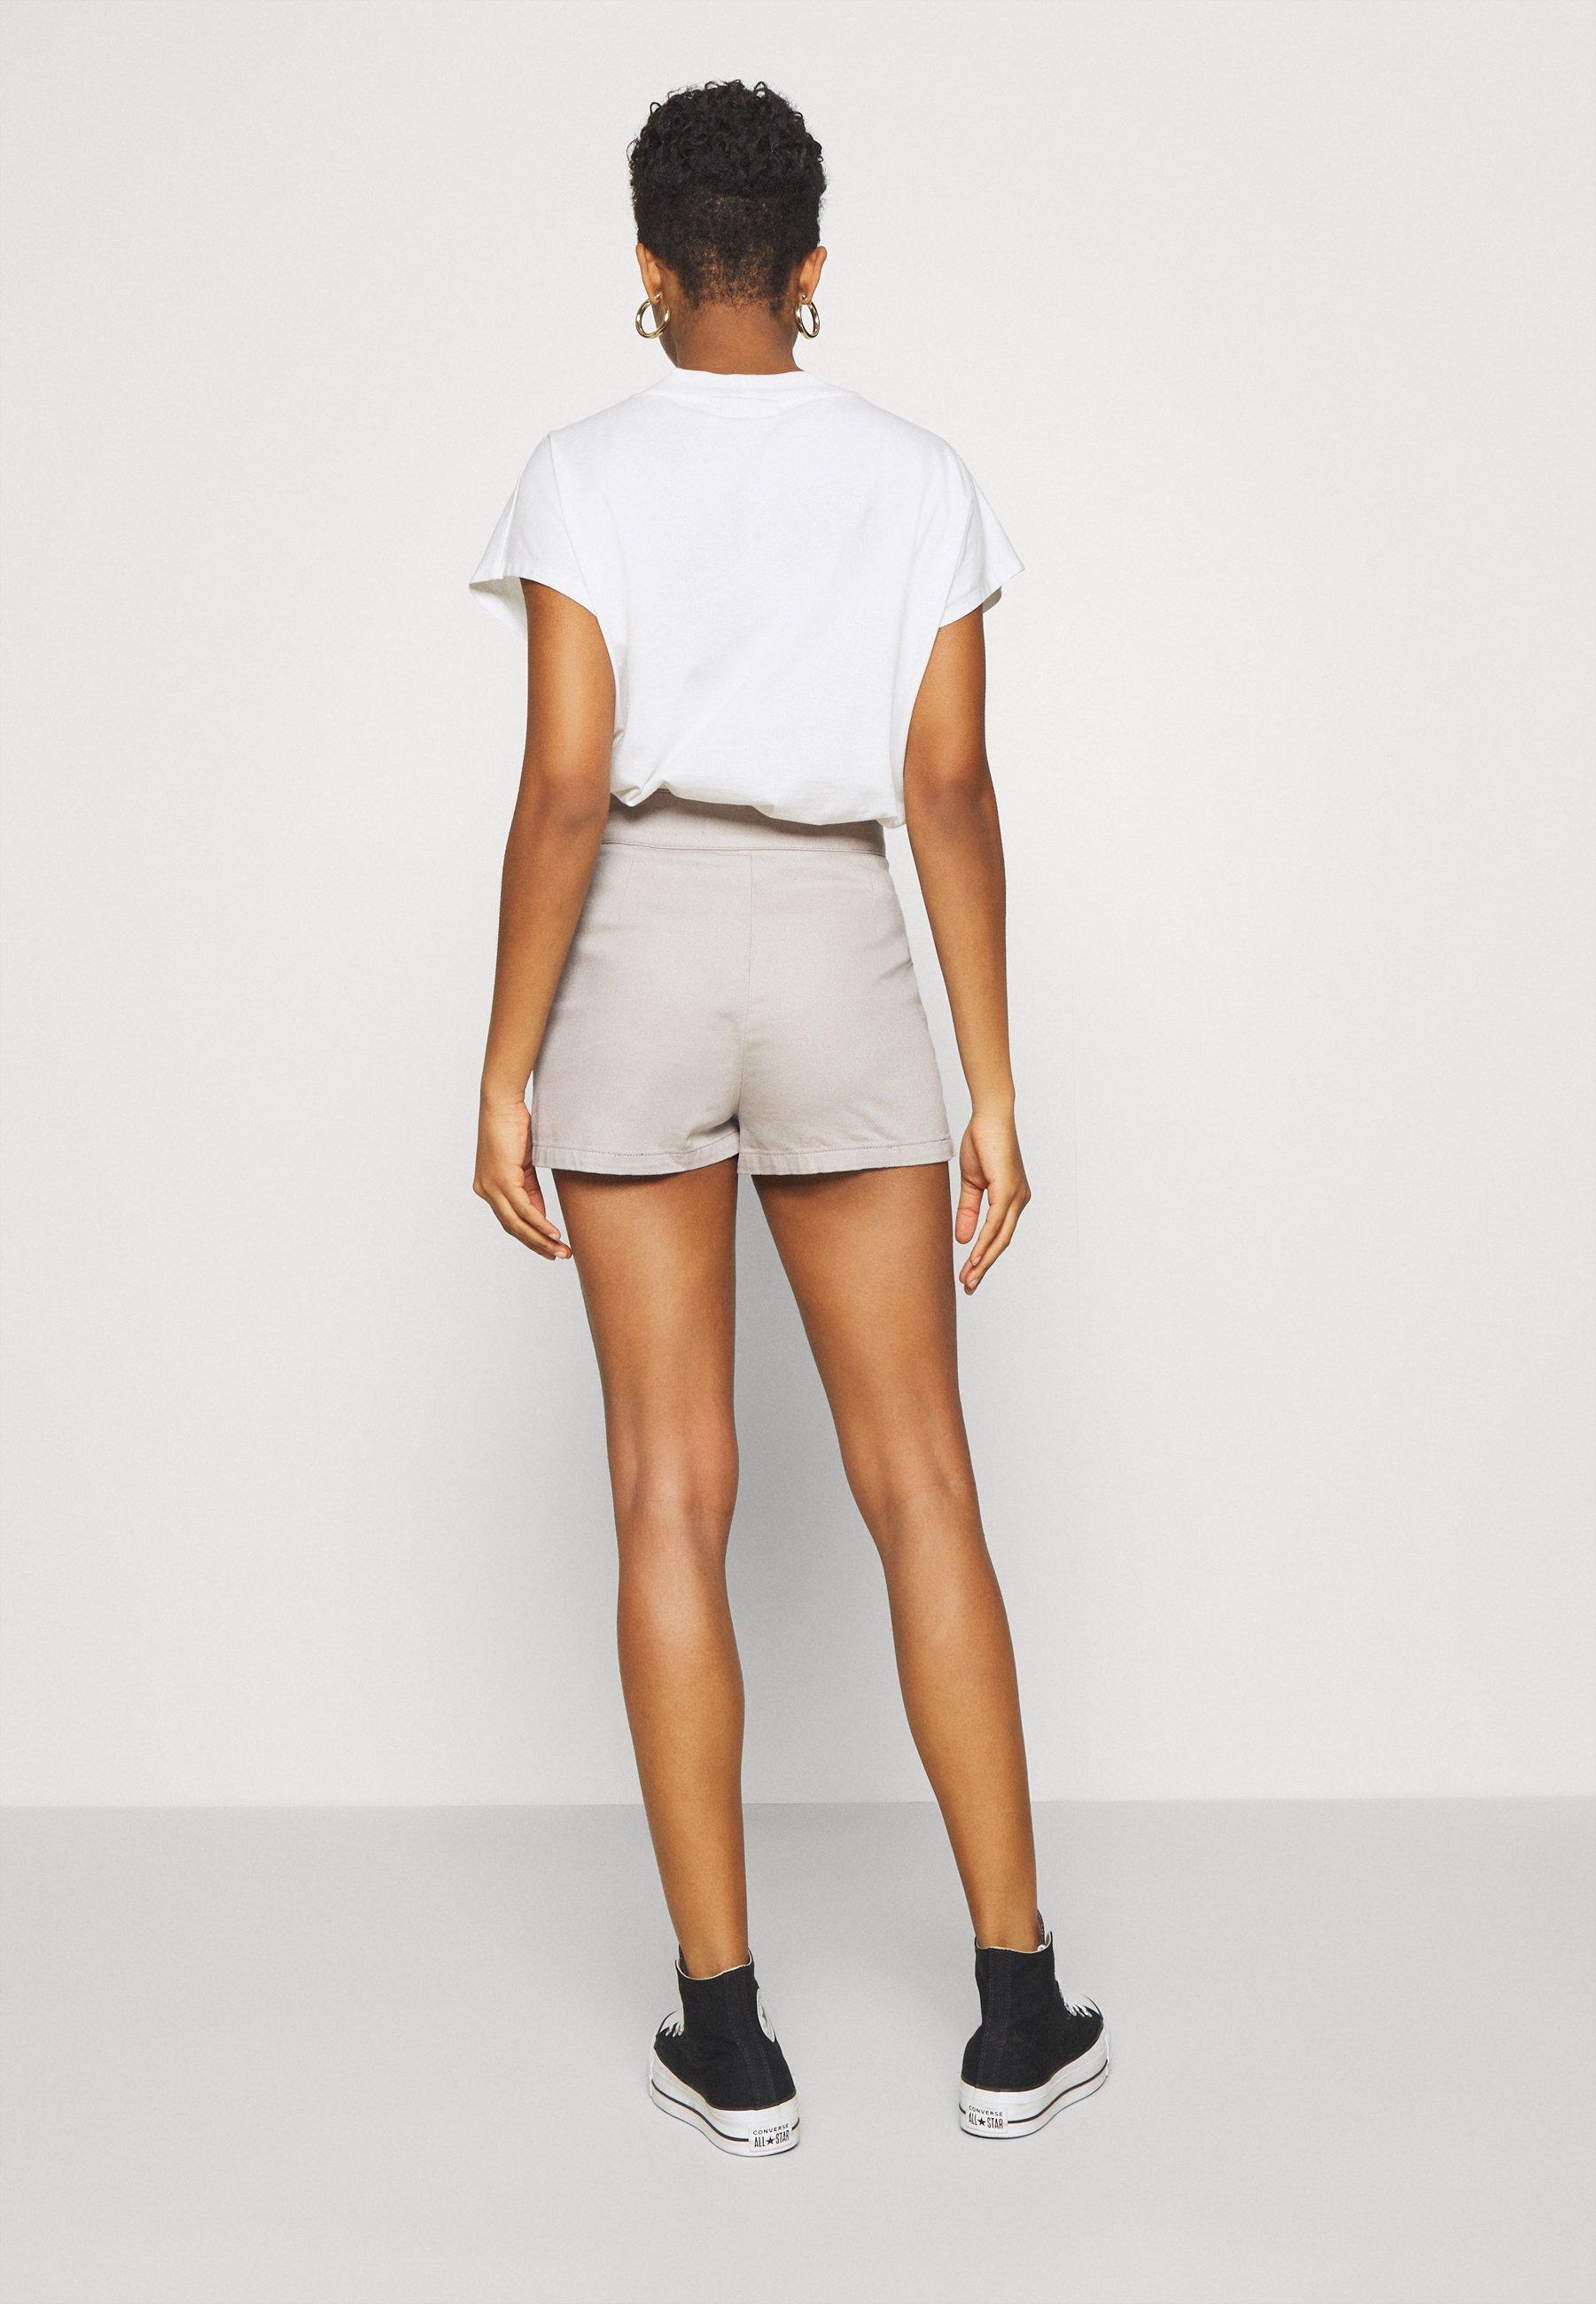 NU-IN WRAP OVER SKIRT - Denim shorts - grey - Women's Clothing MlMZa